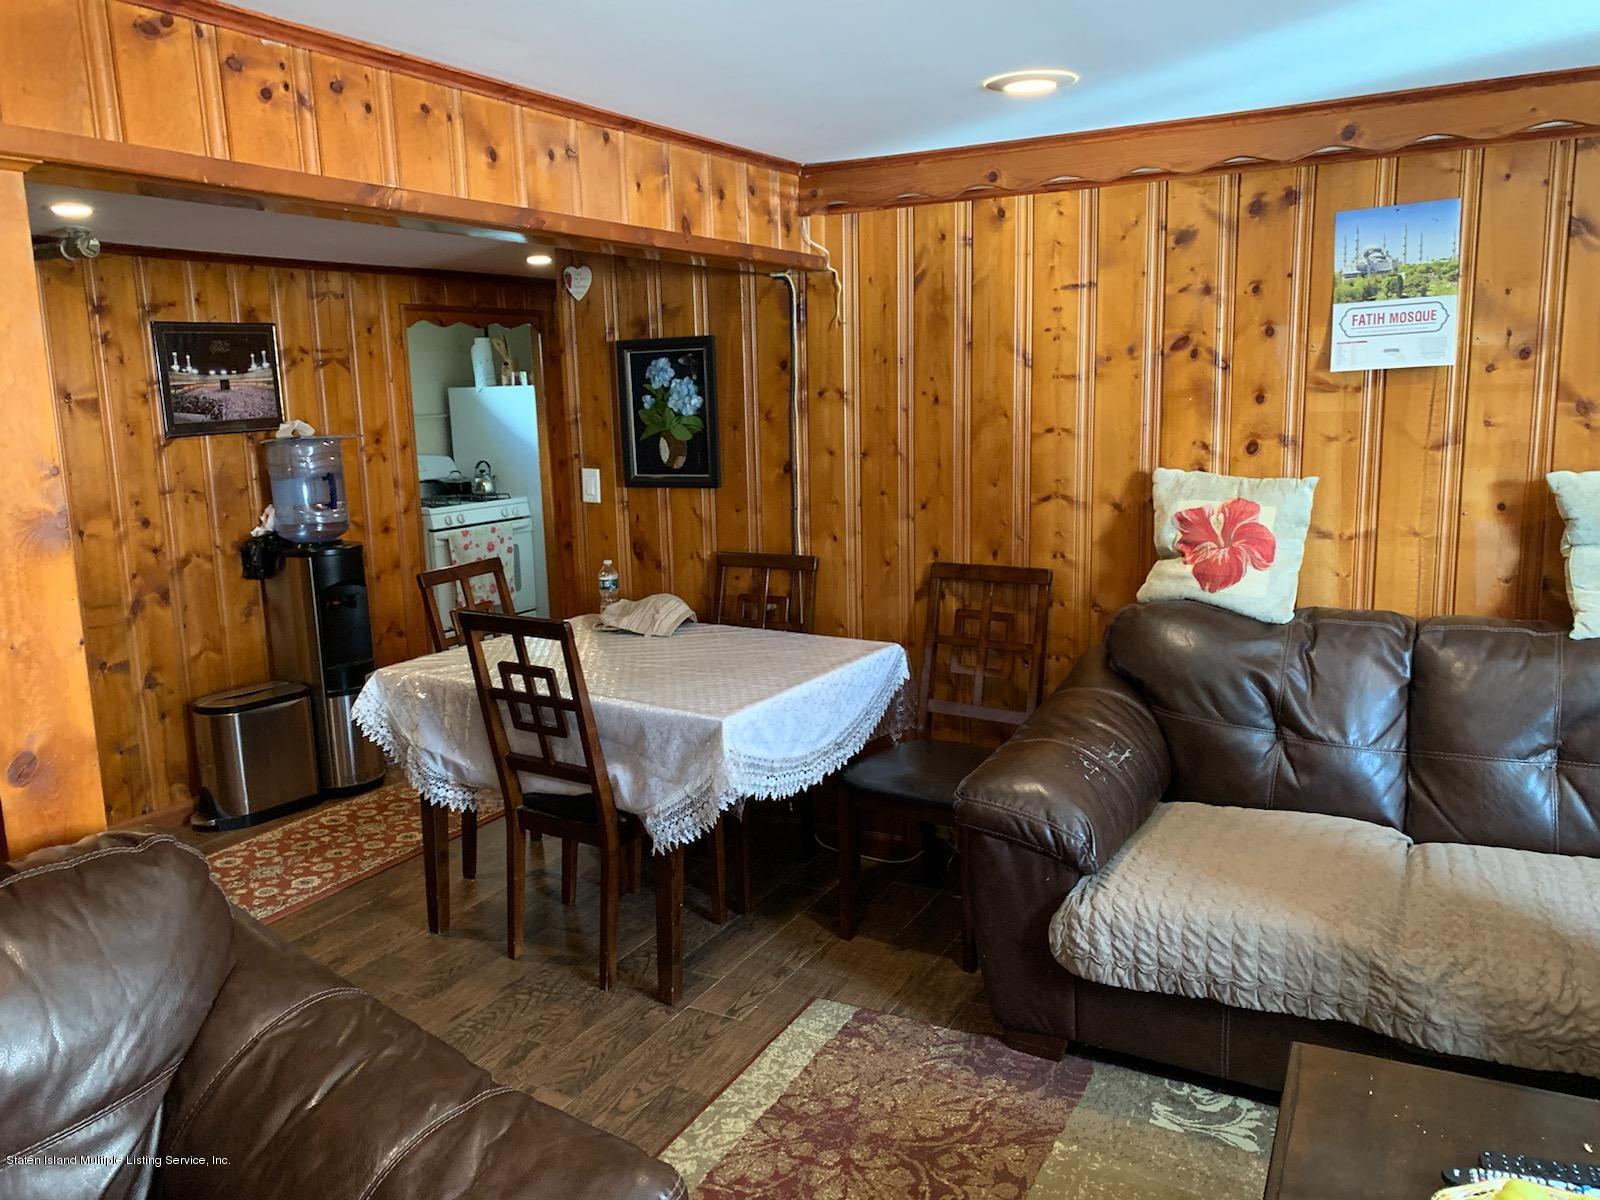 Single Family - Detached 58 Guyon Avenue  Staten Island, NY 10306, MLS-1135873-12